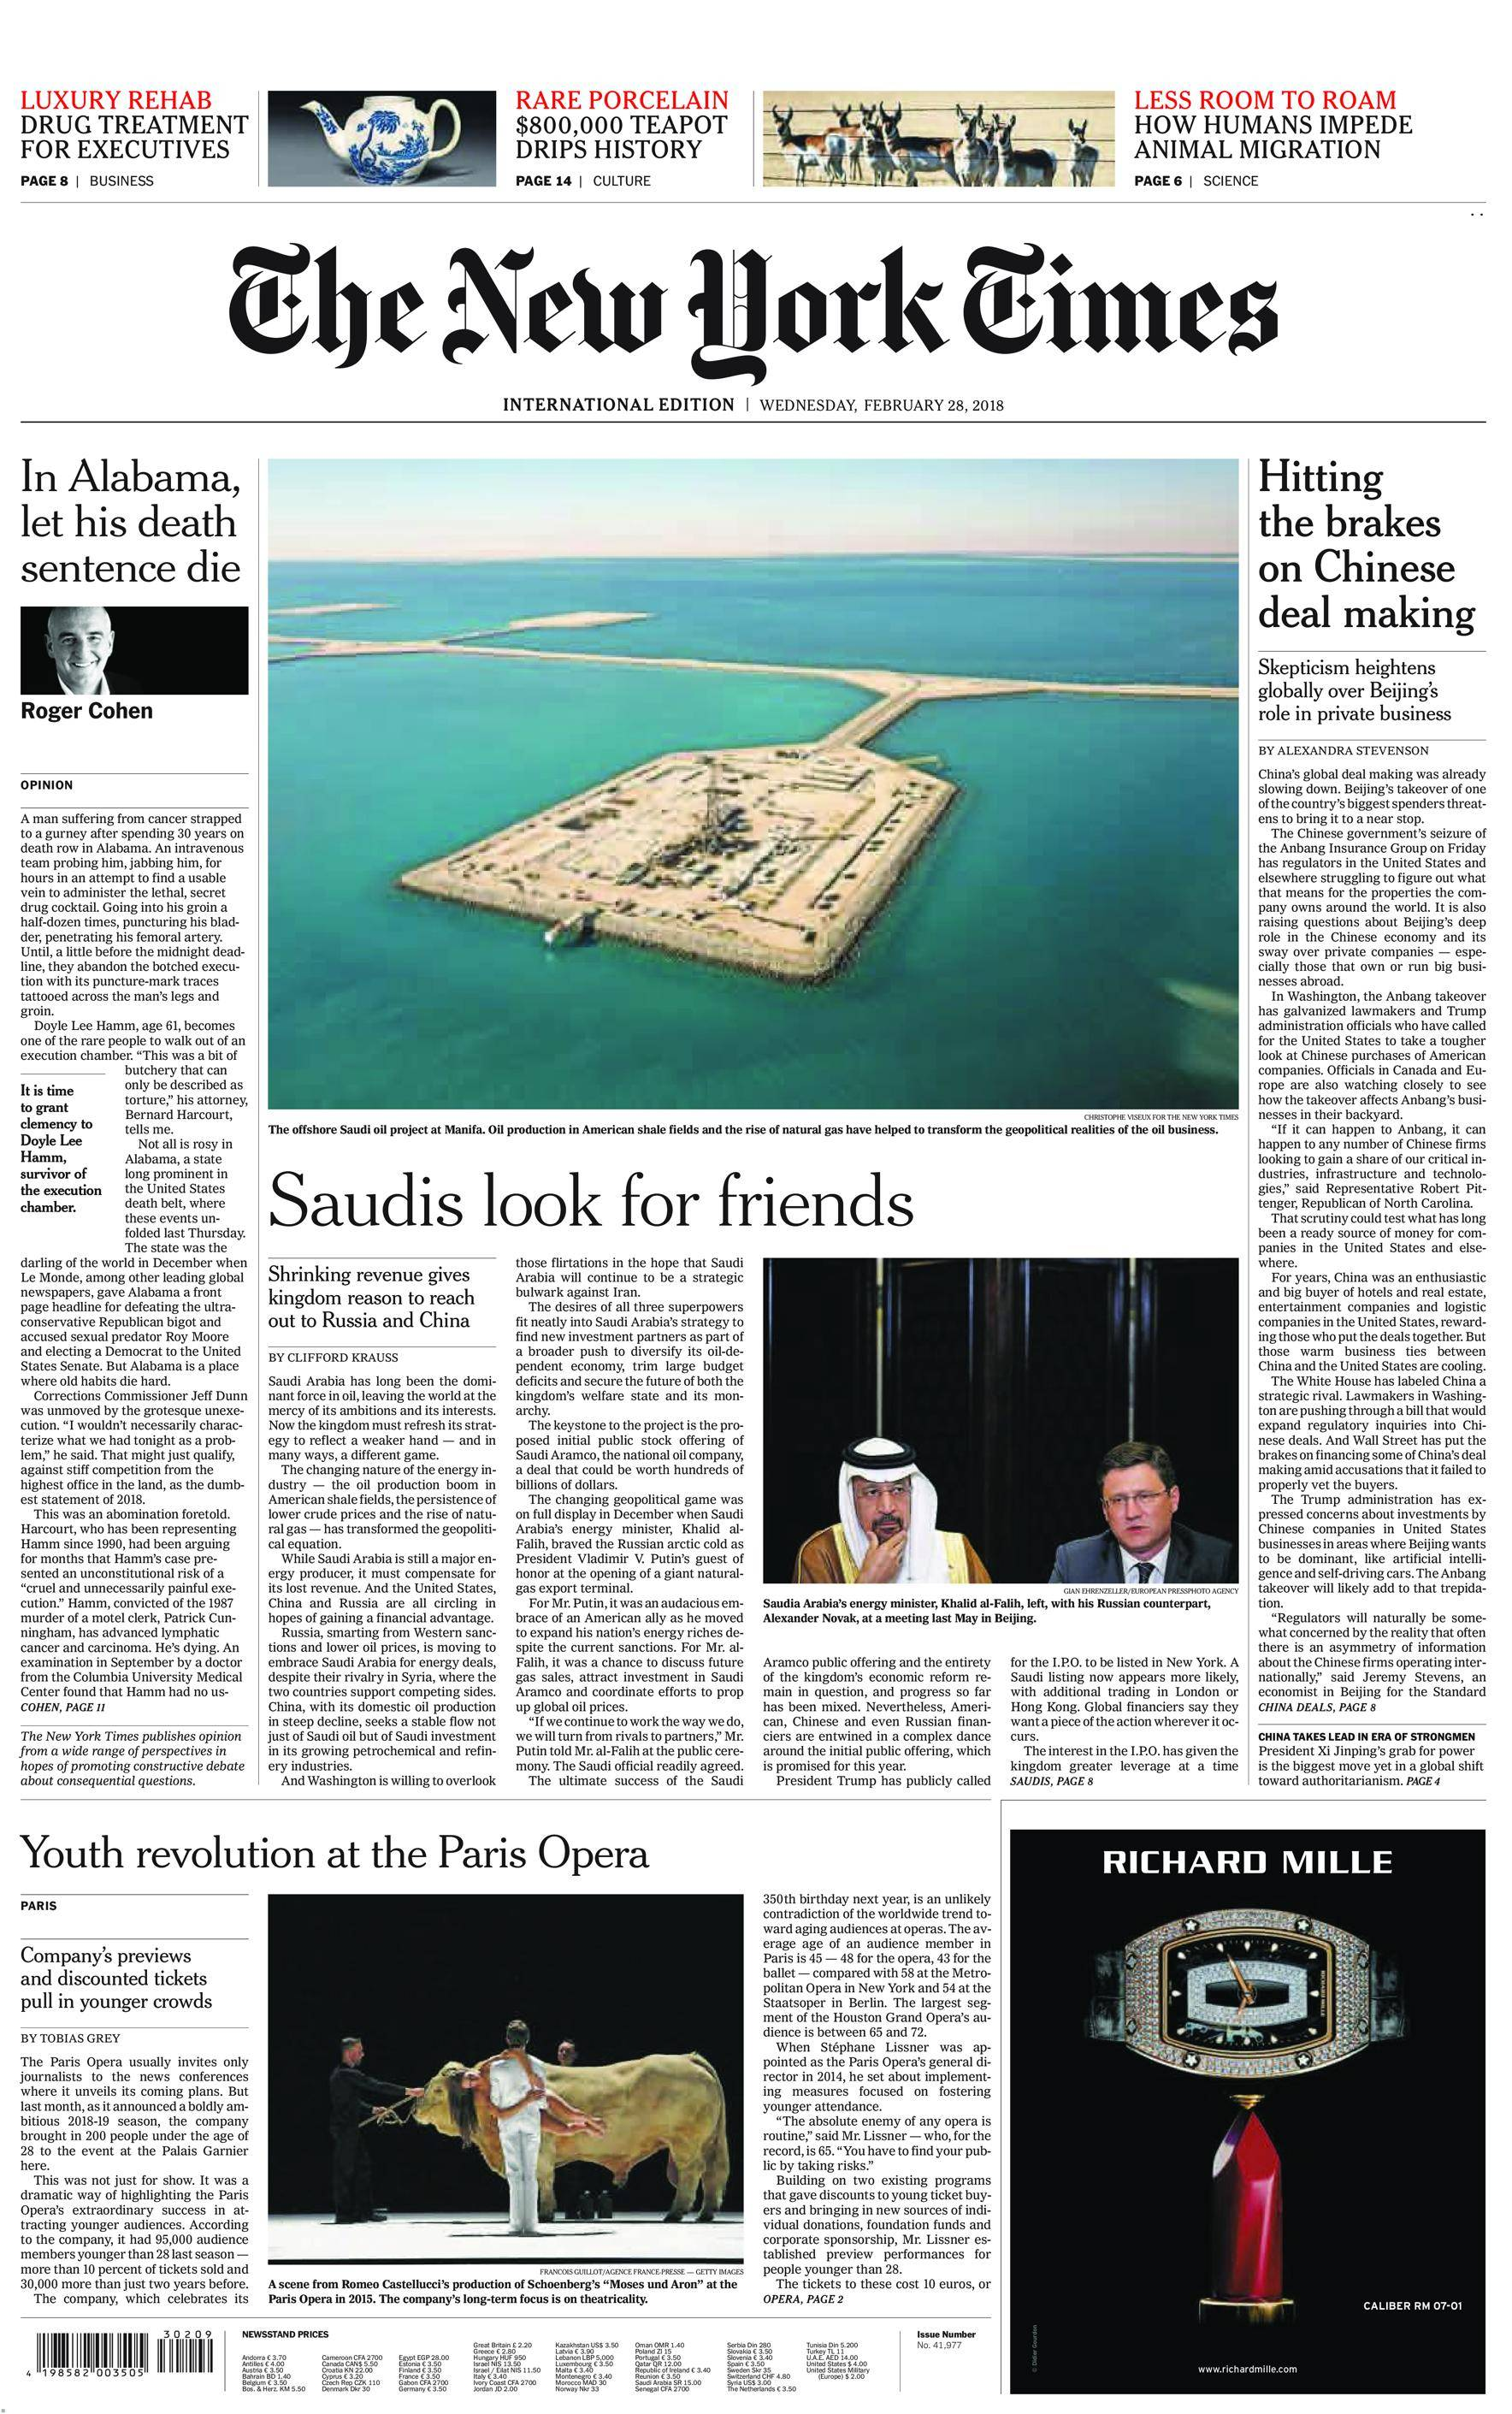 International New York Times - 28 February 2018